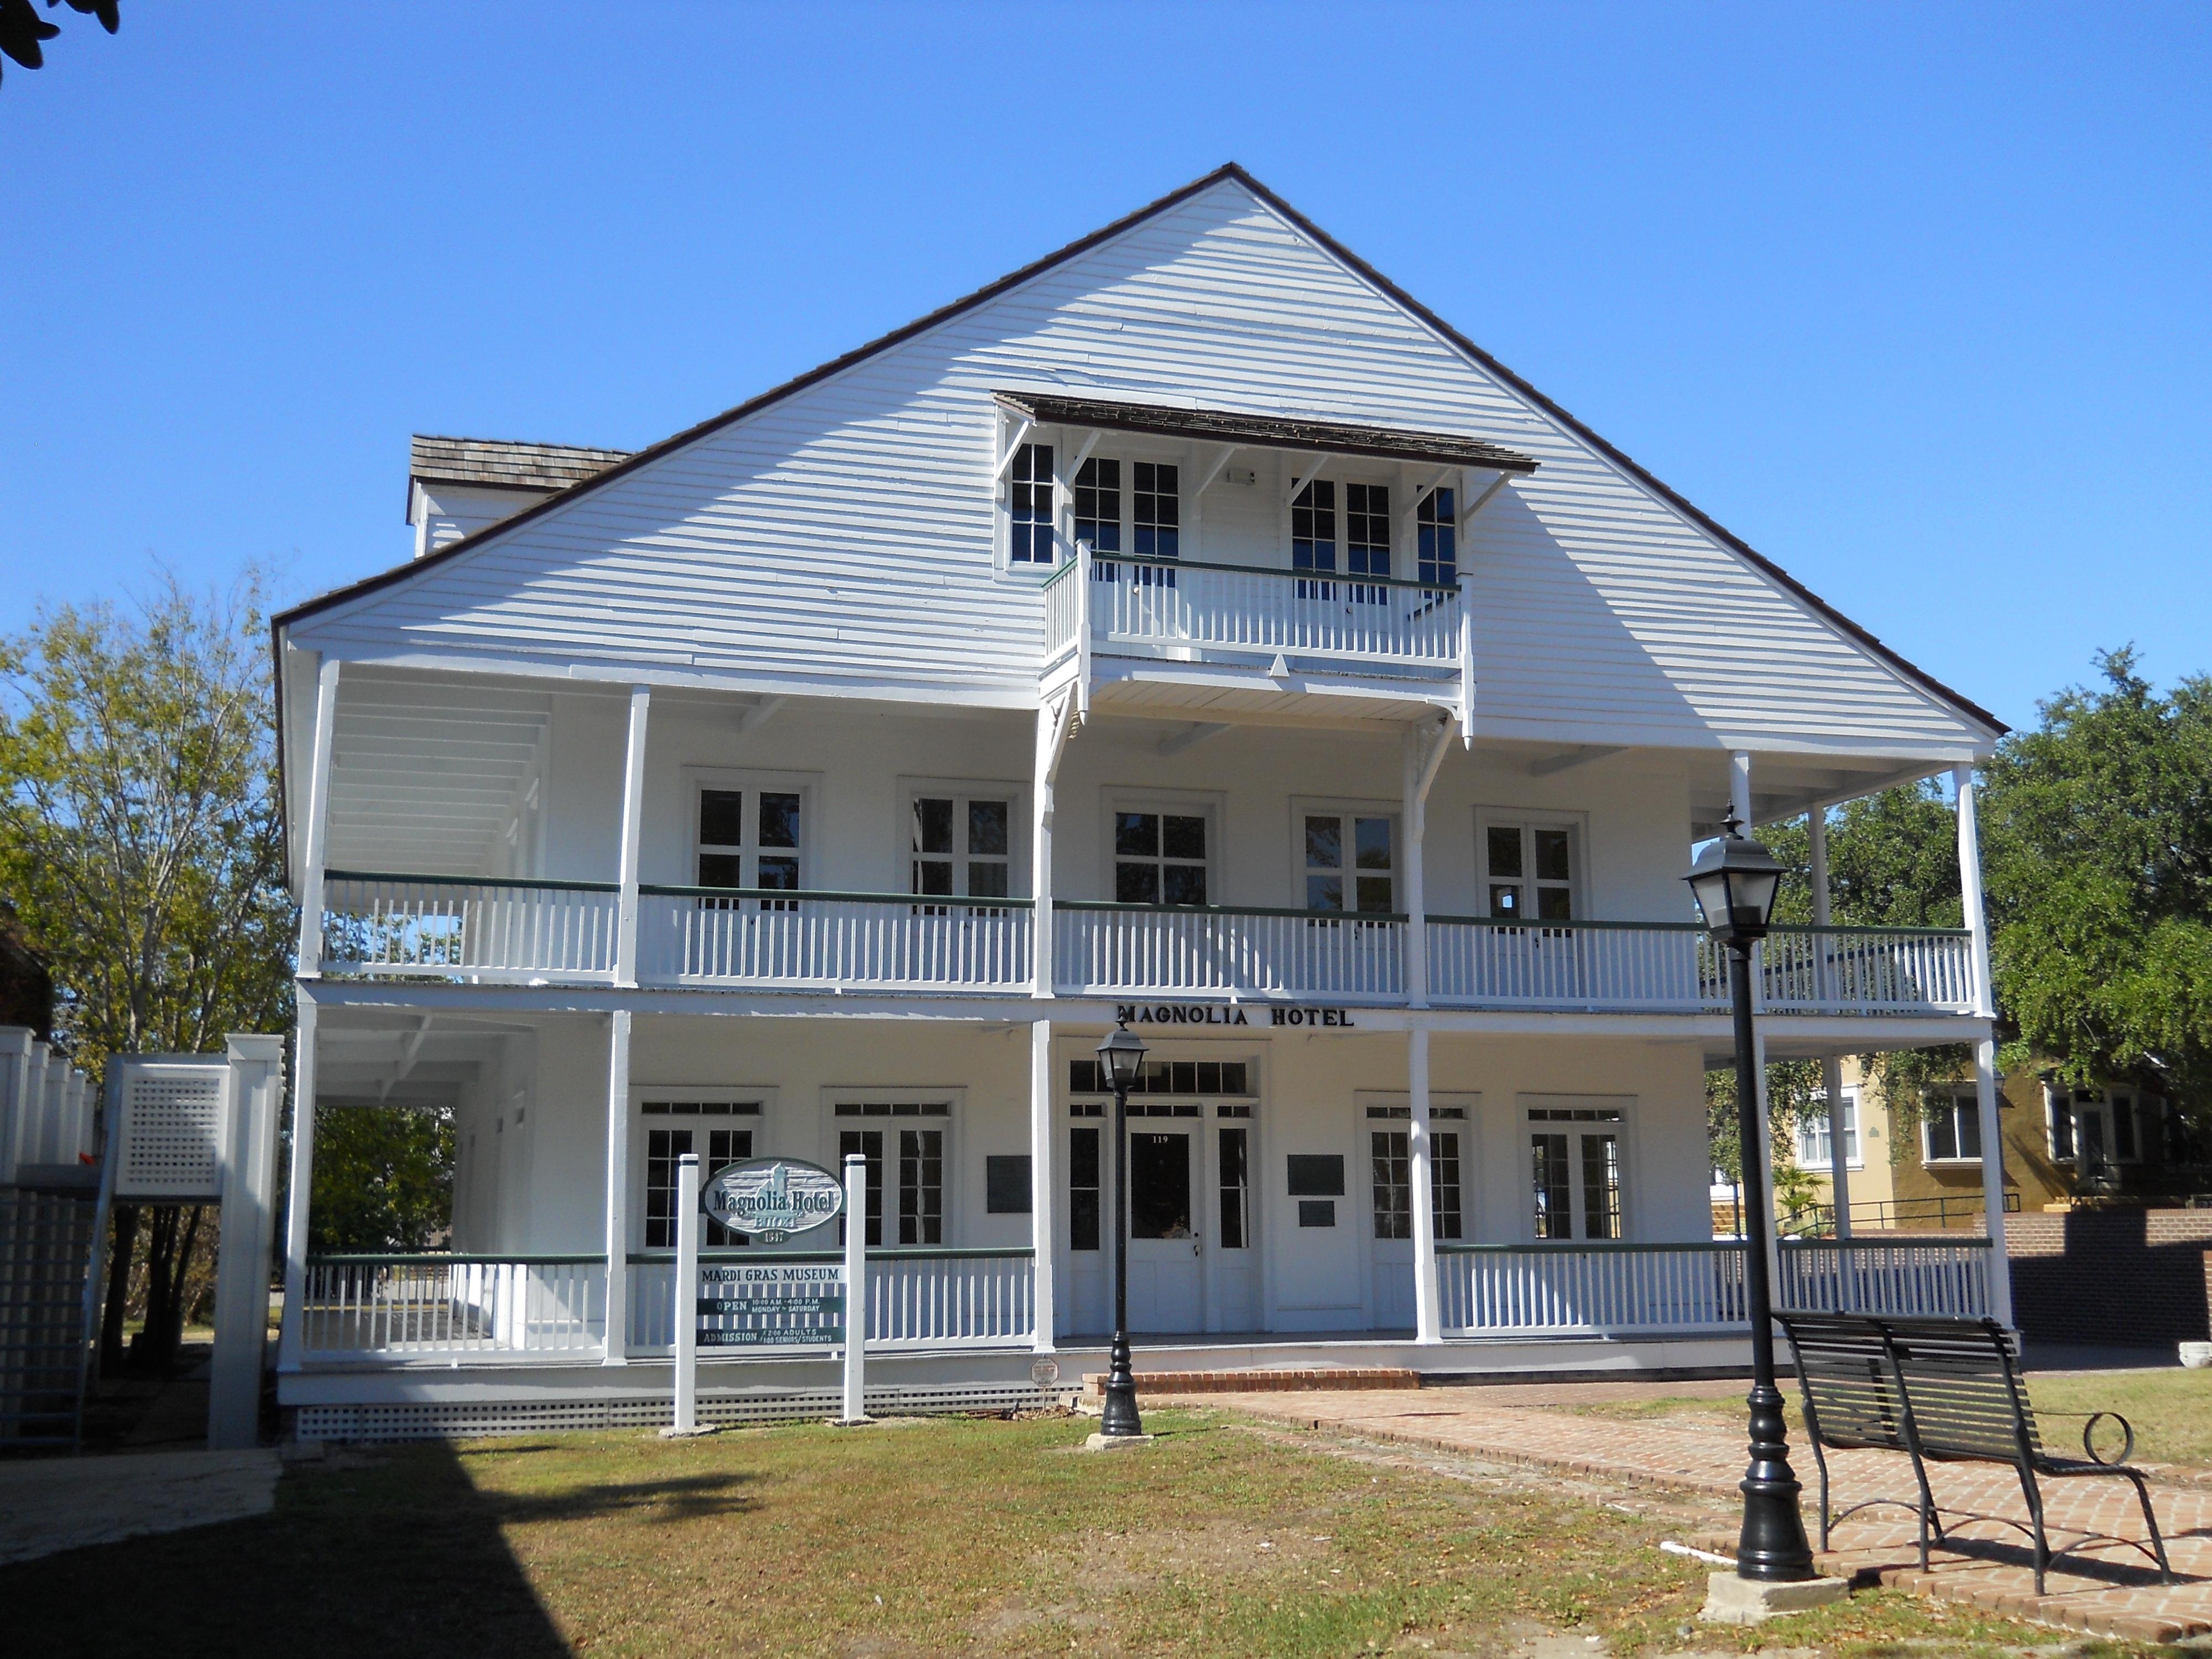 File Magnolia Hotel Biloxi Mississippi Jpg Wikimedia Commons